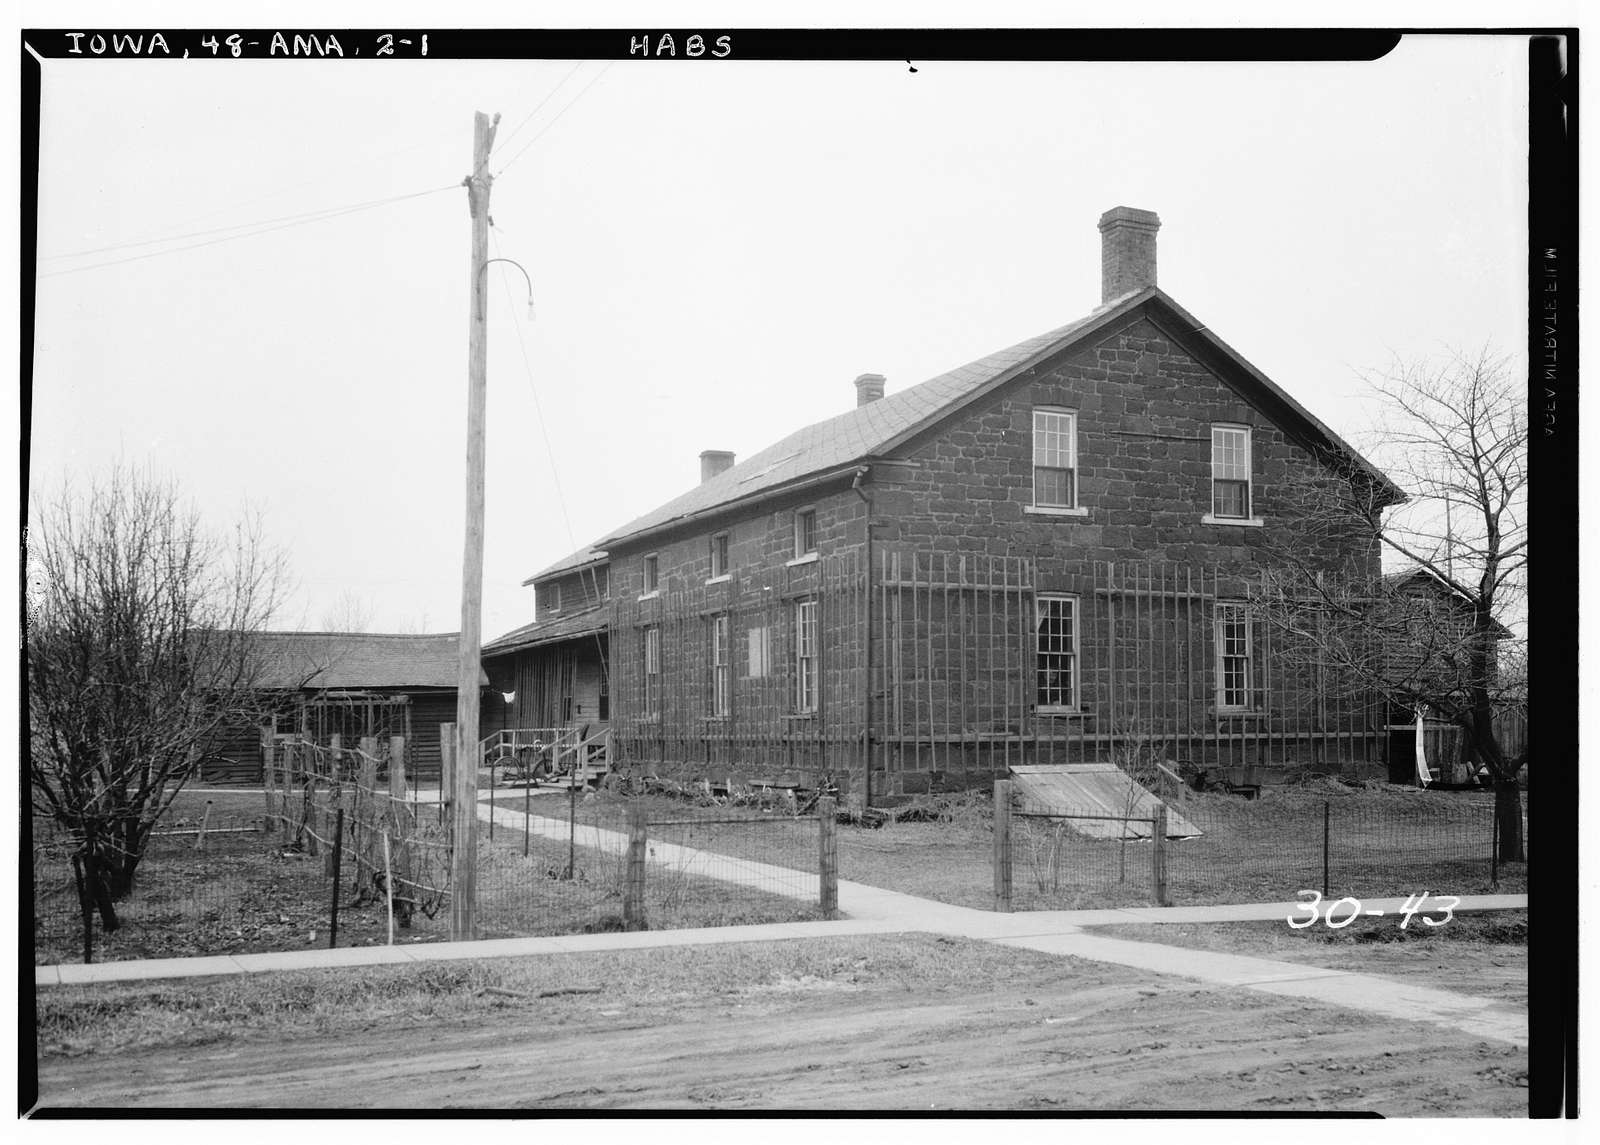 Pitz Meetinghouse, State Route 220 Vicinity, Amana, Iowa County, IA